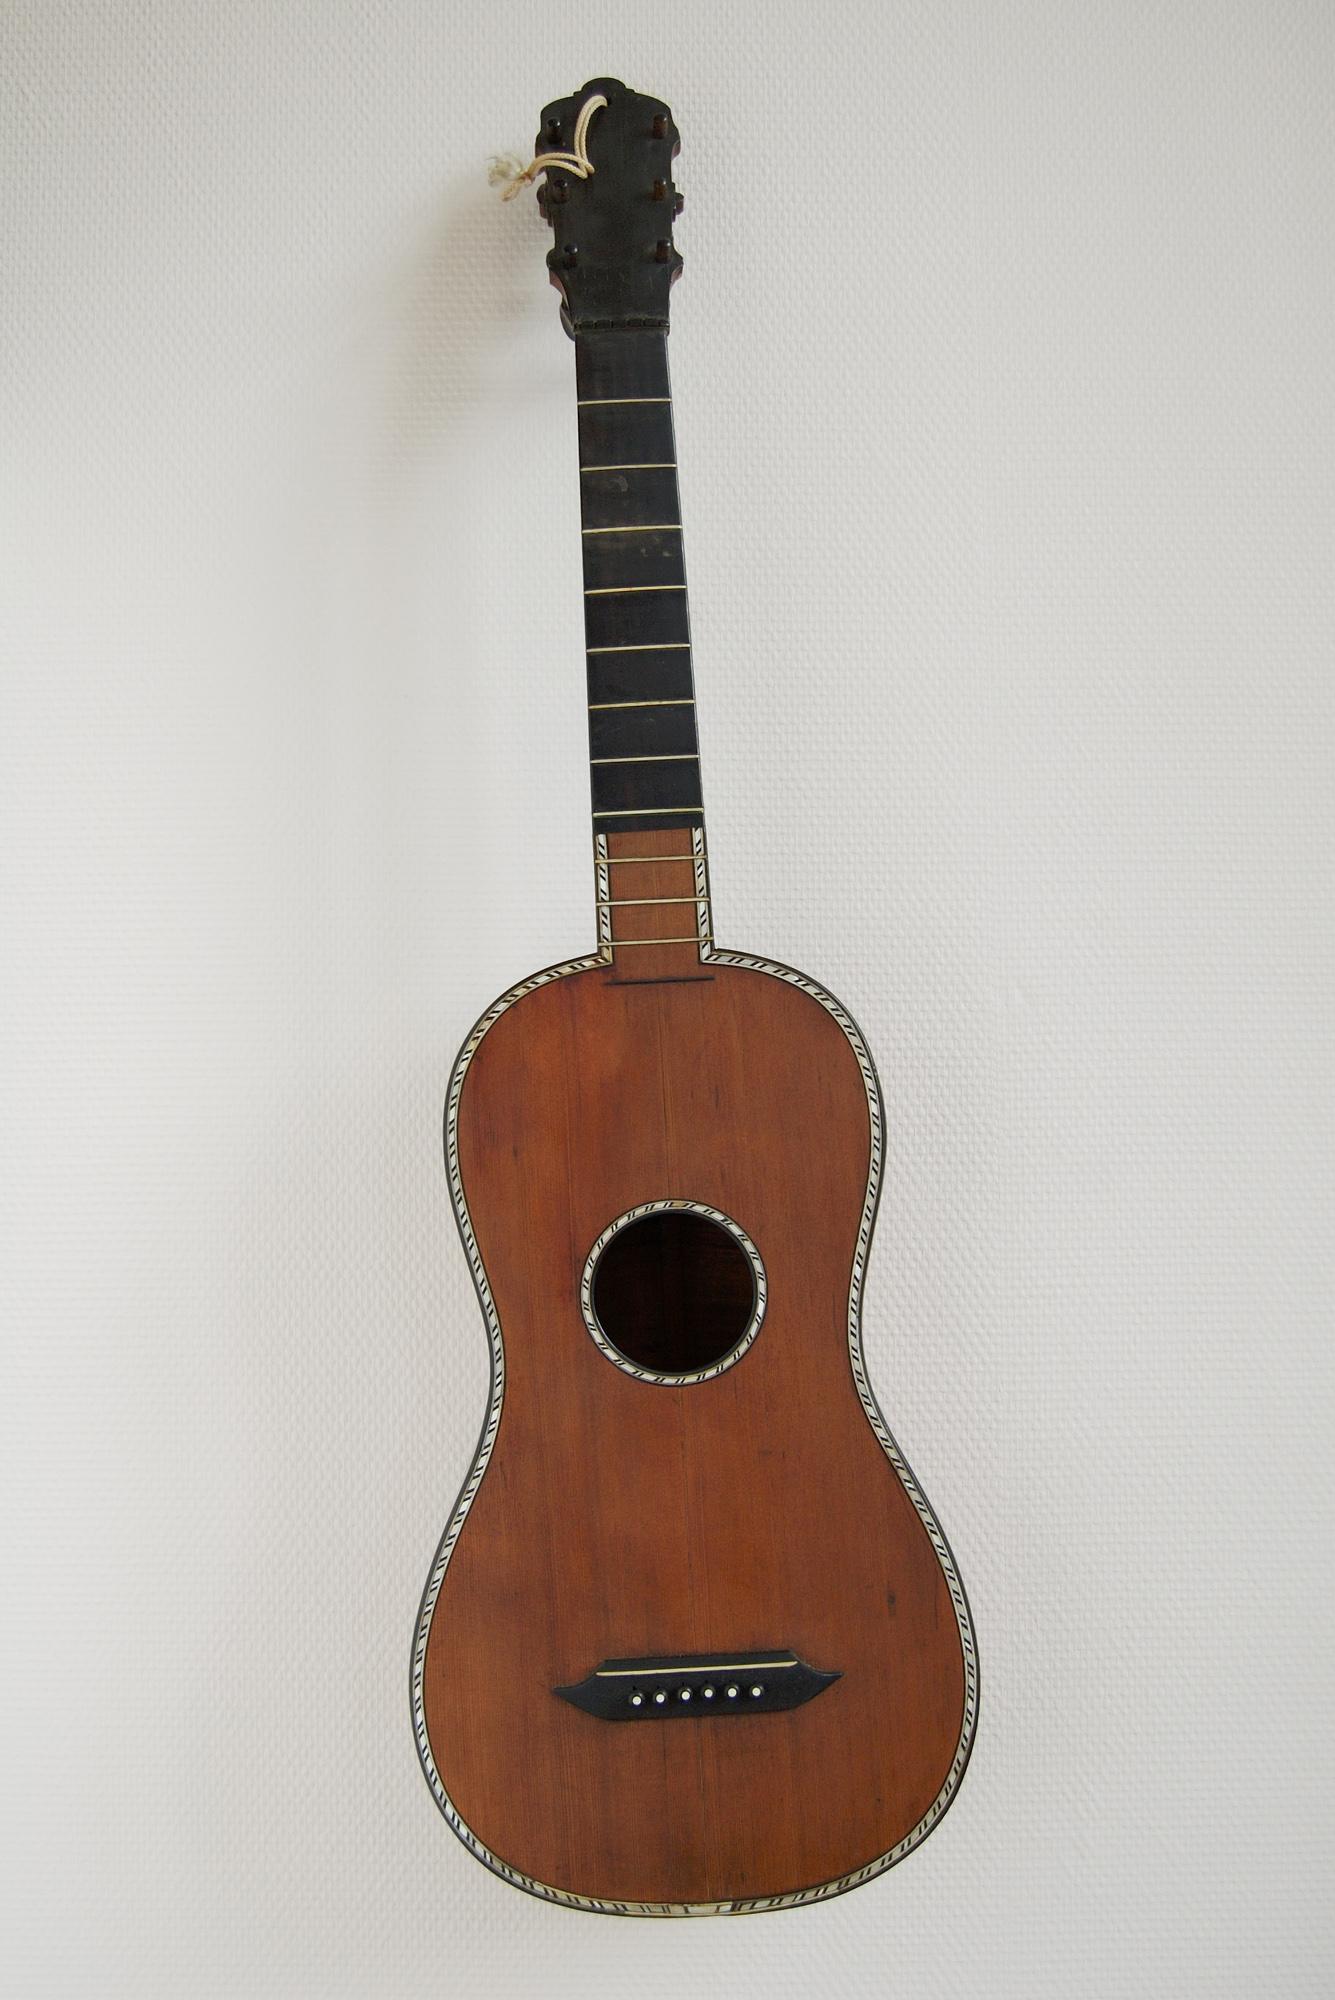 Anonyme-du-XIXe-siècle-Guitare-n°-inv-1988-4